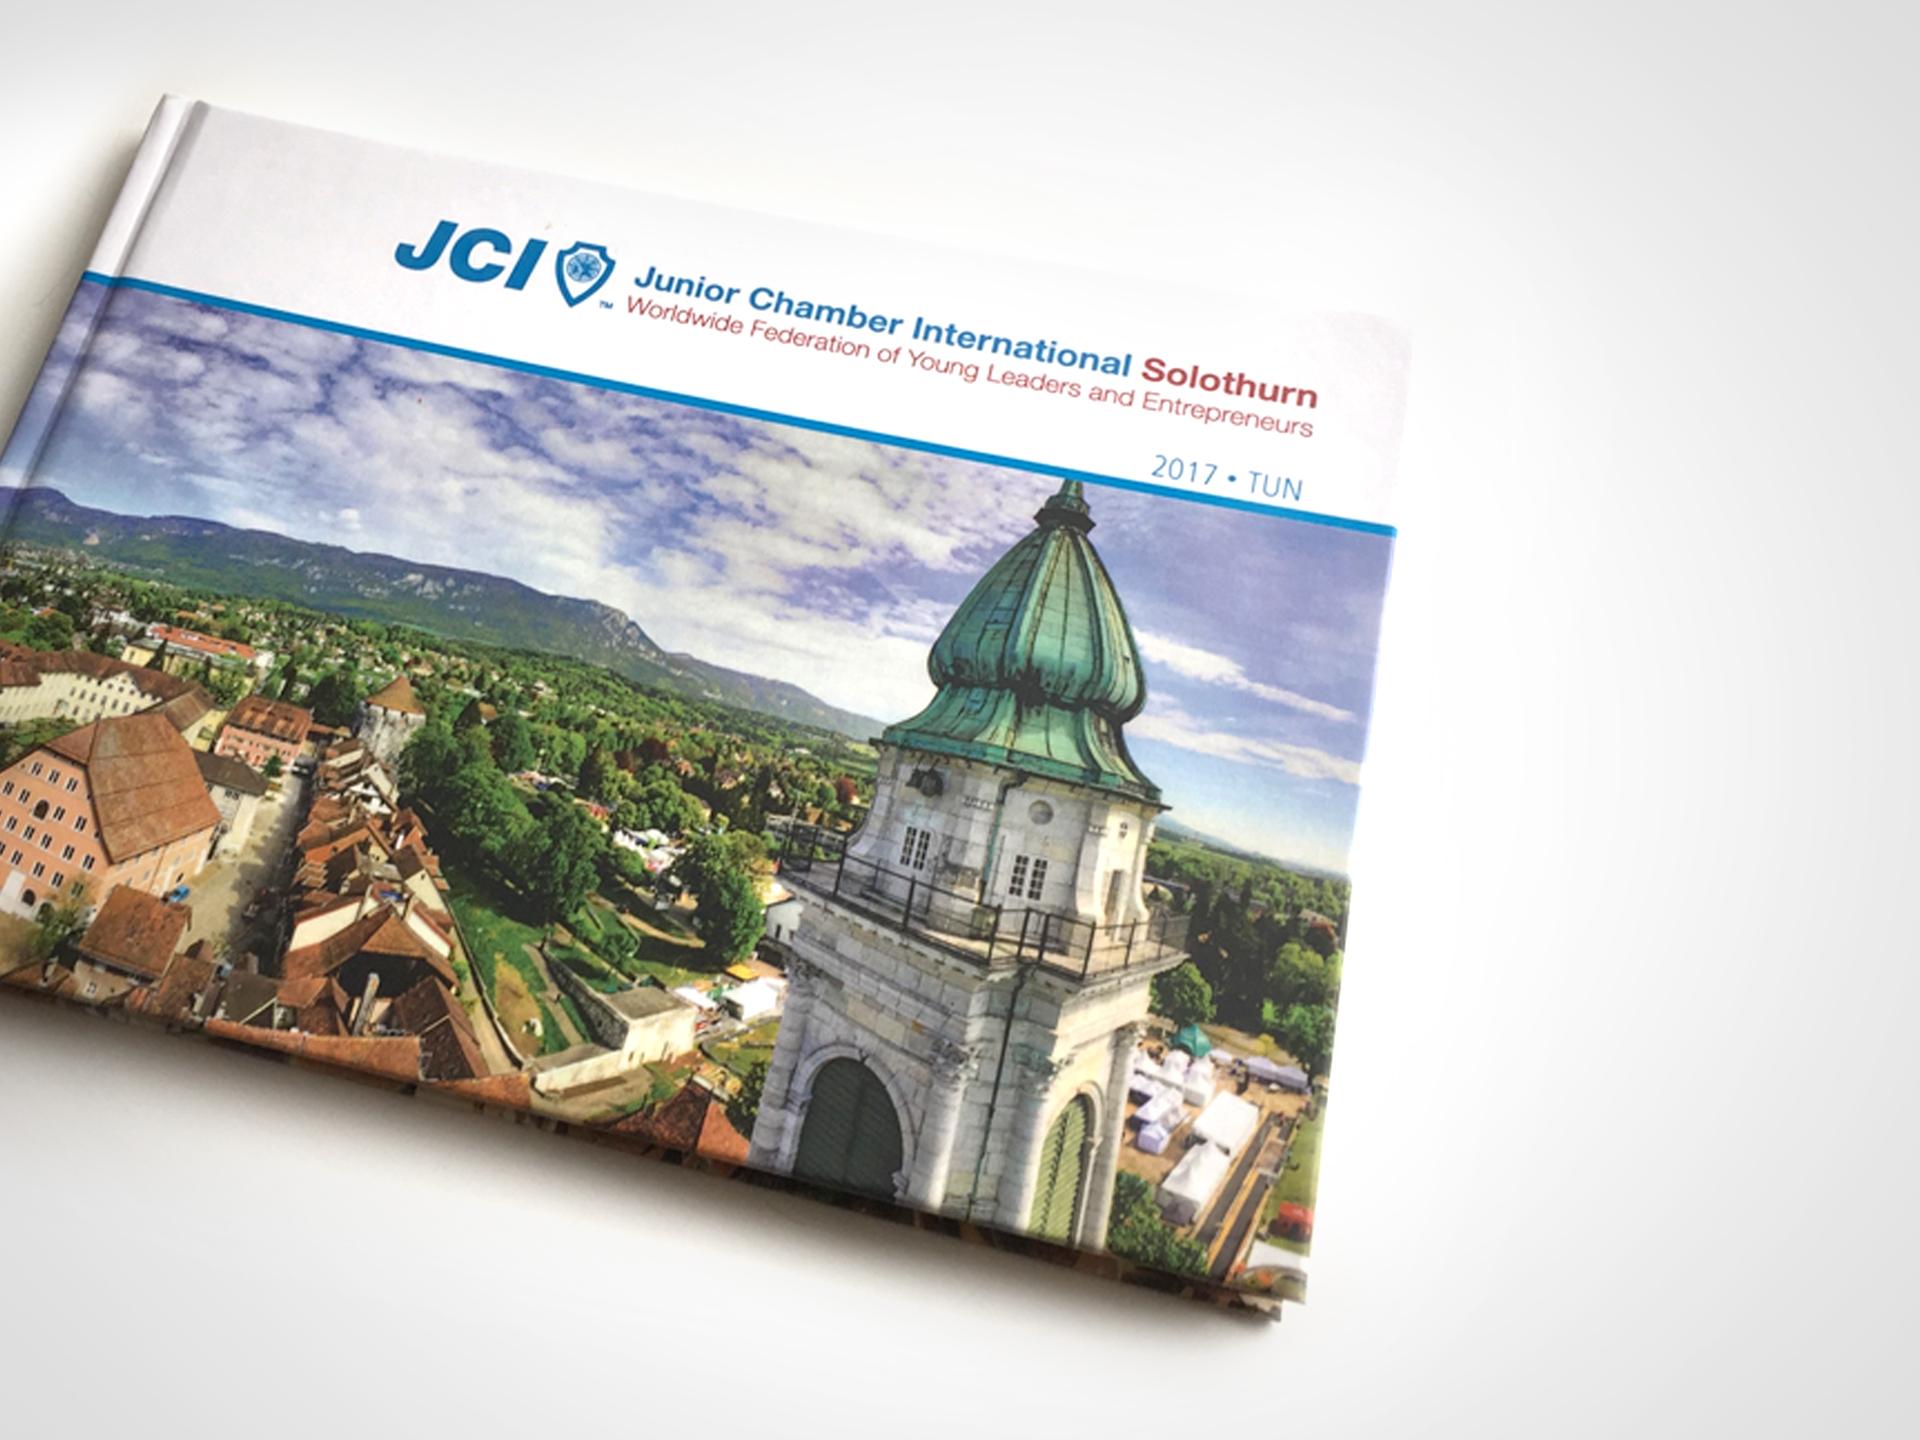 SM Graphic Design Logodesign Editorial Magazin Buch Buchgestaltung Foto Fotoretouche Solothurn Stadt Jahresrückblick